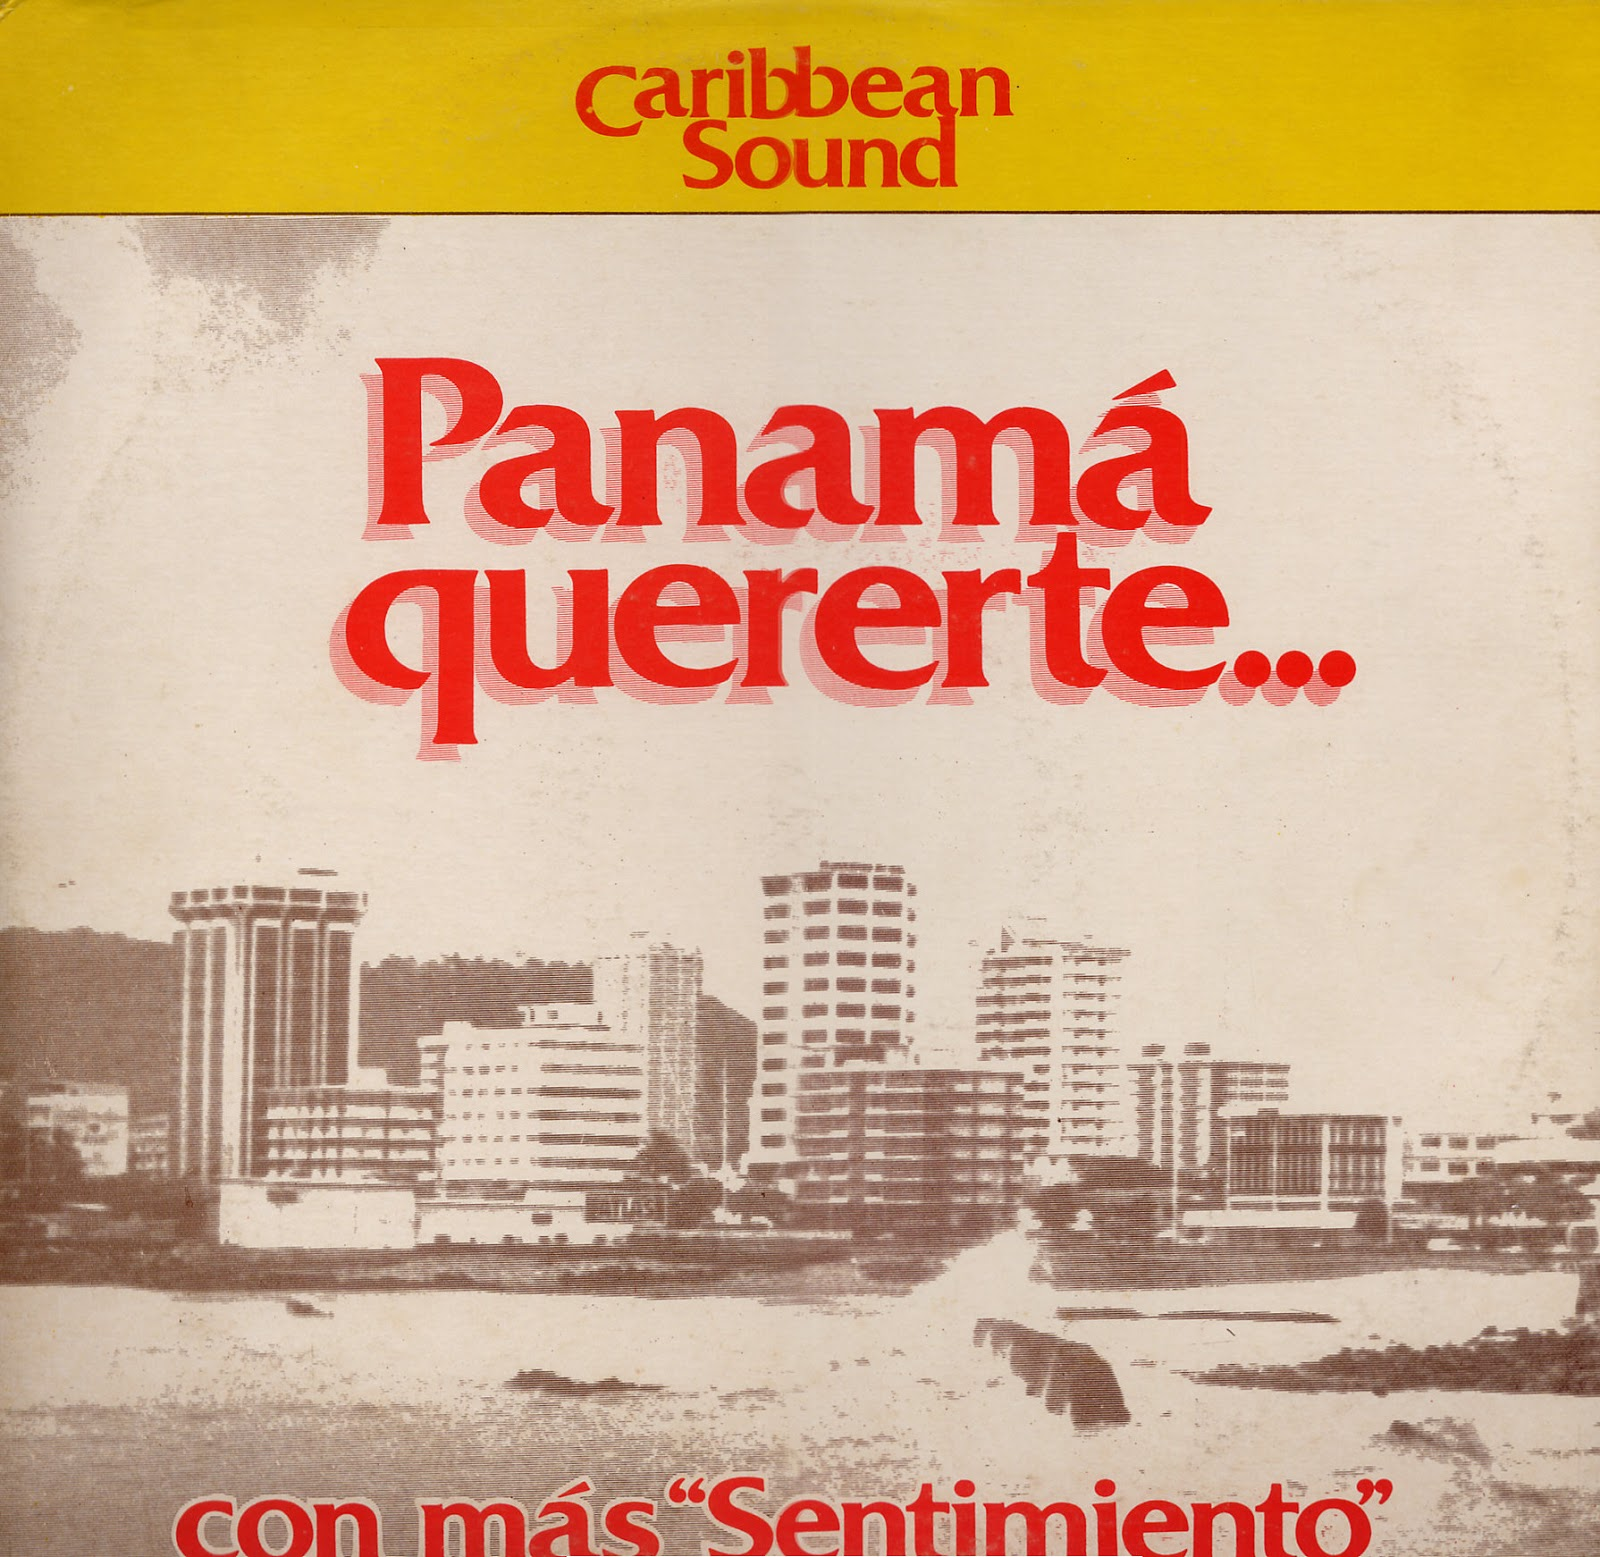 Caribbean Sound Caribbean Sound